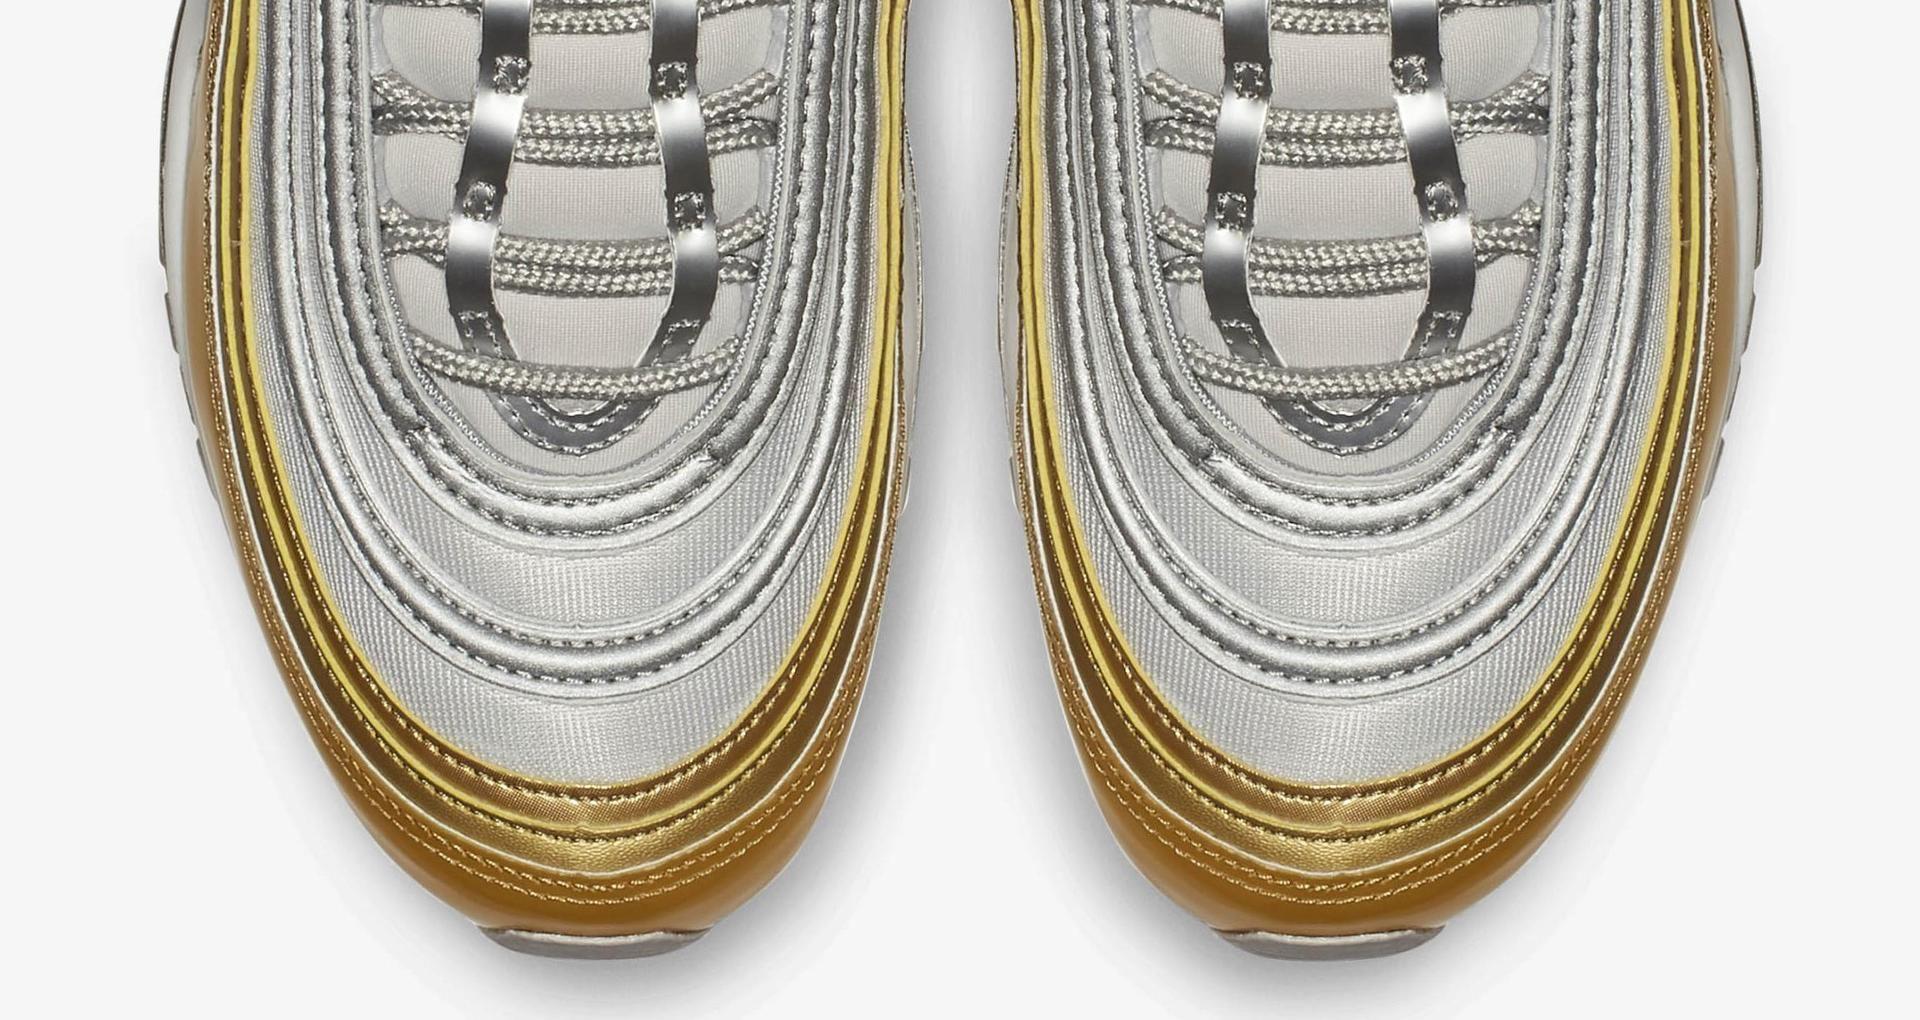 Nike Air Max 97 SE Vast GreyMetallic Gold Women's Shoe